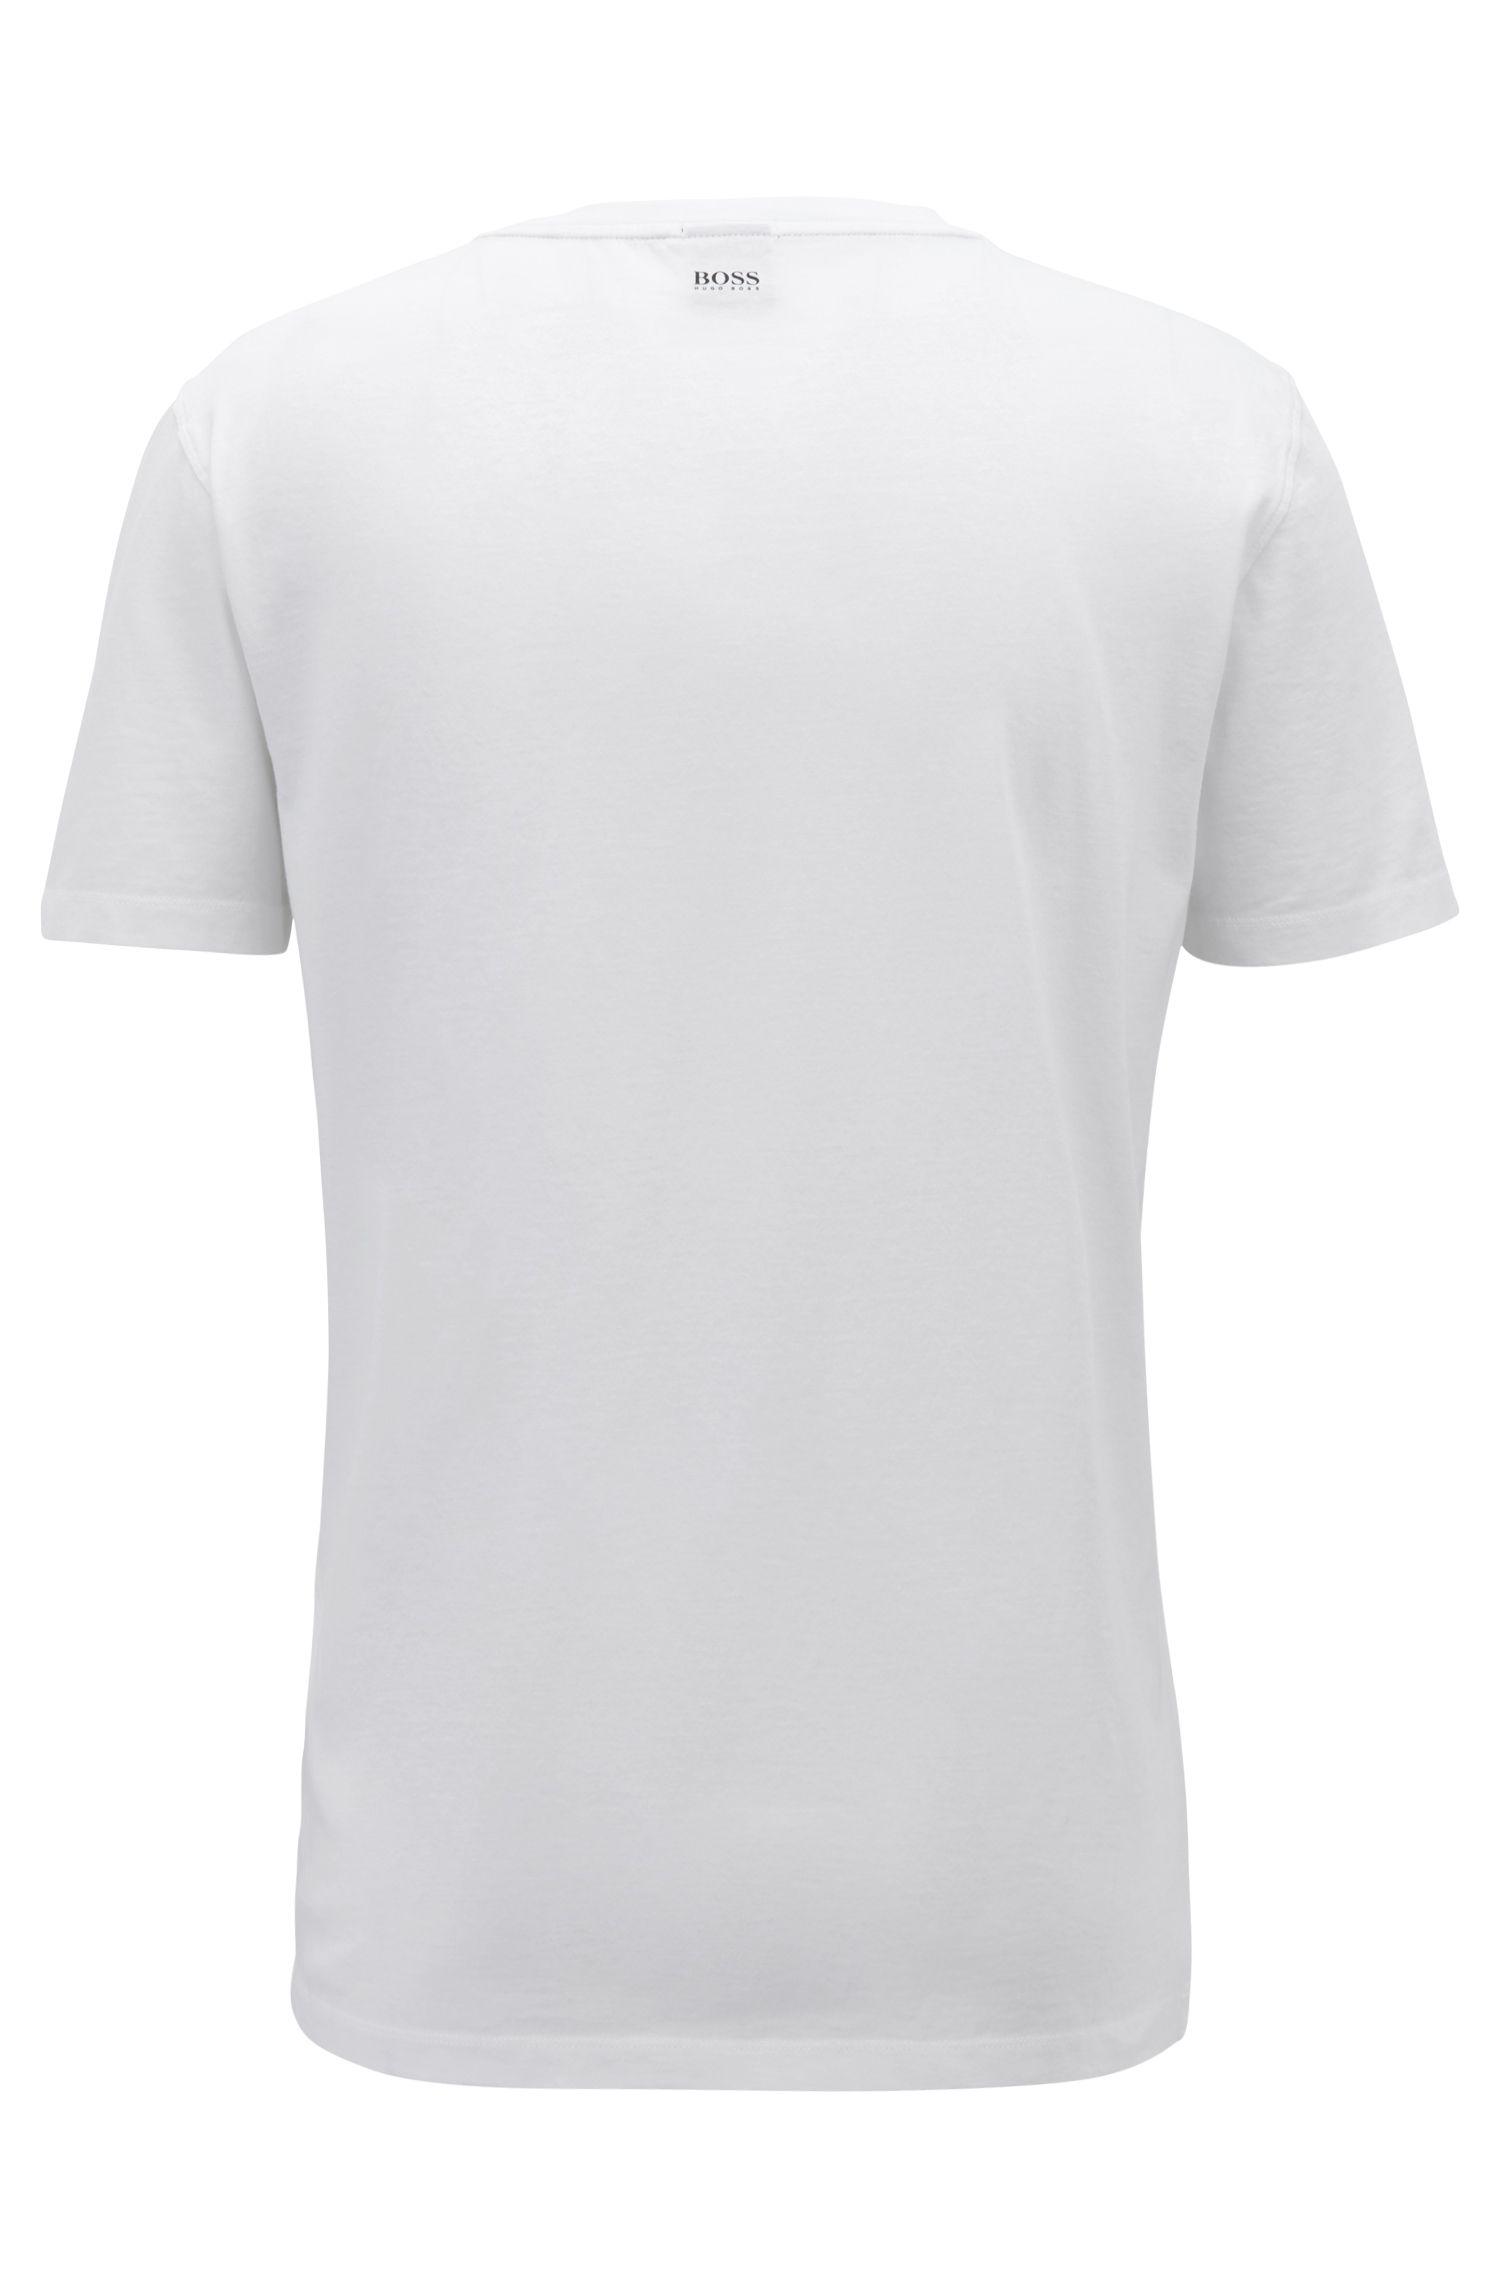 Digitally printed T-shirt in Pima cotton, White